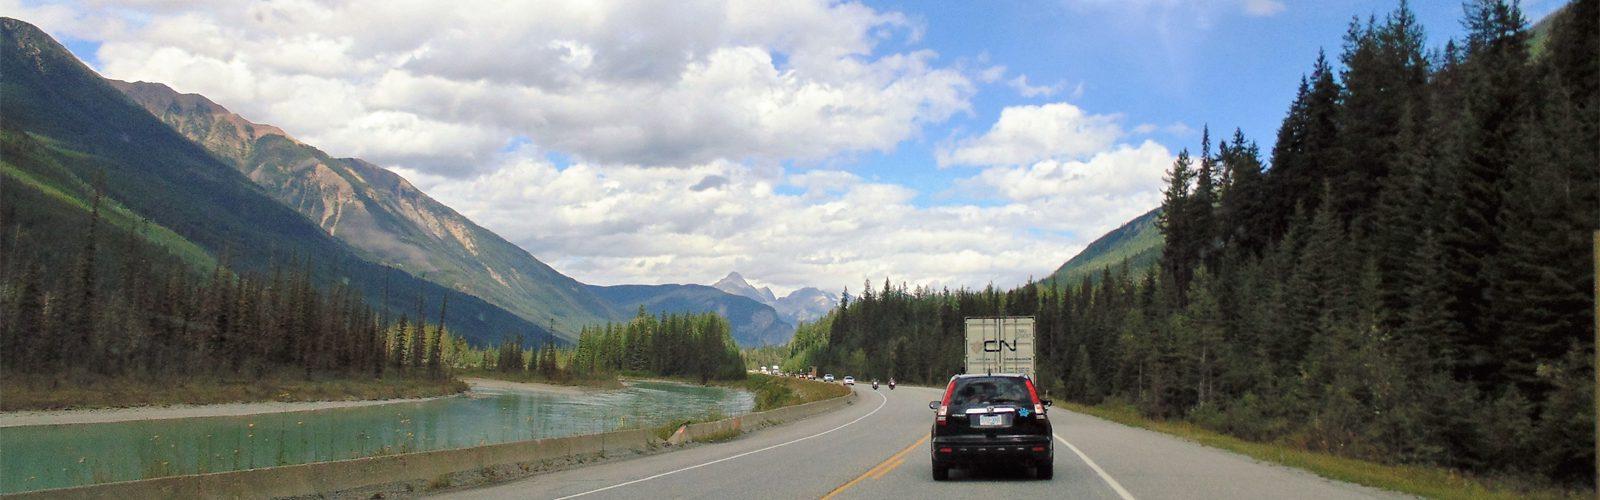 Kicking Horse River beside Trans-Canada